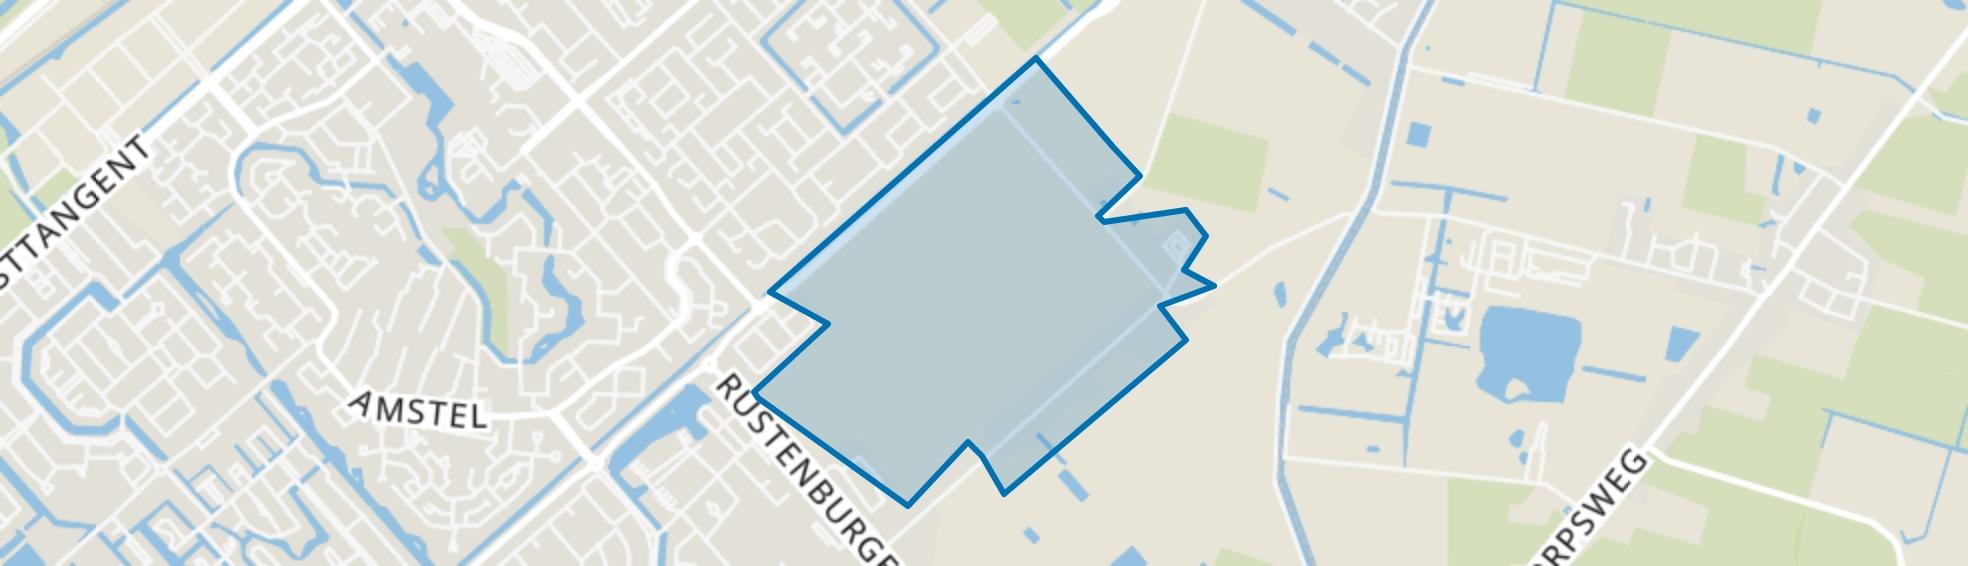 Waarderhout, Heerhugowaard map